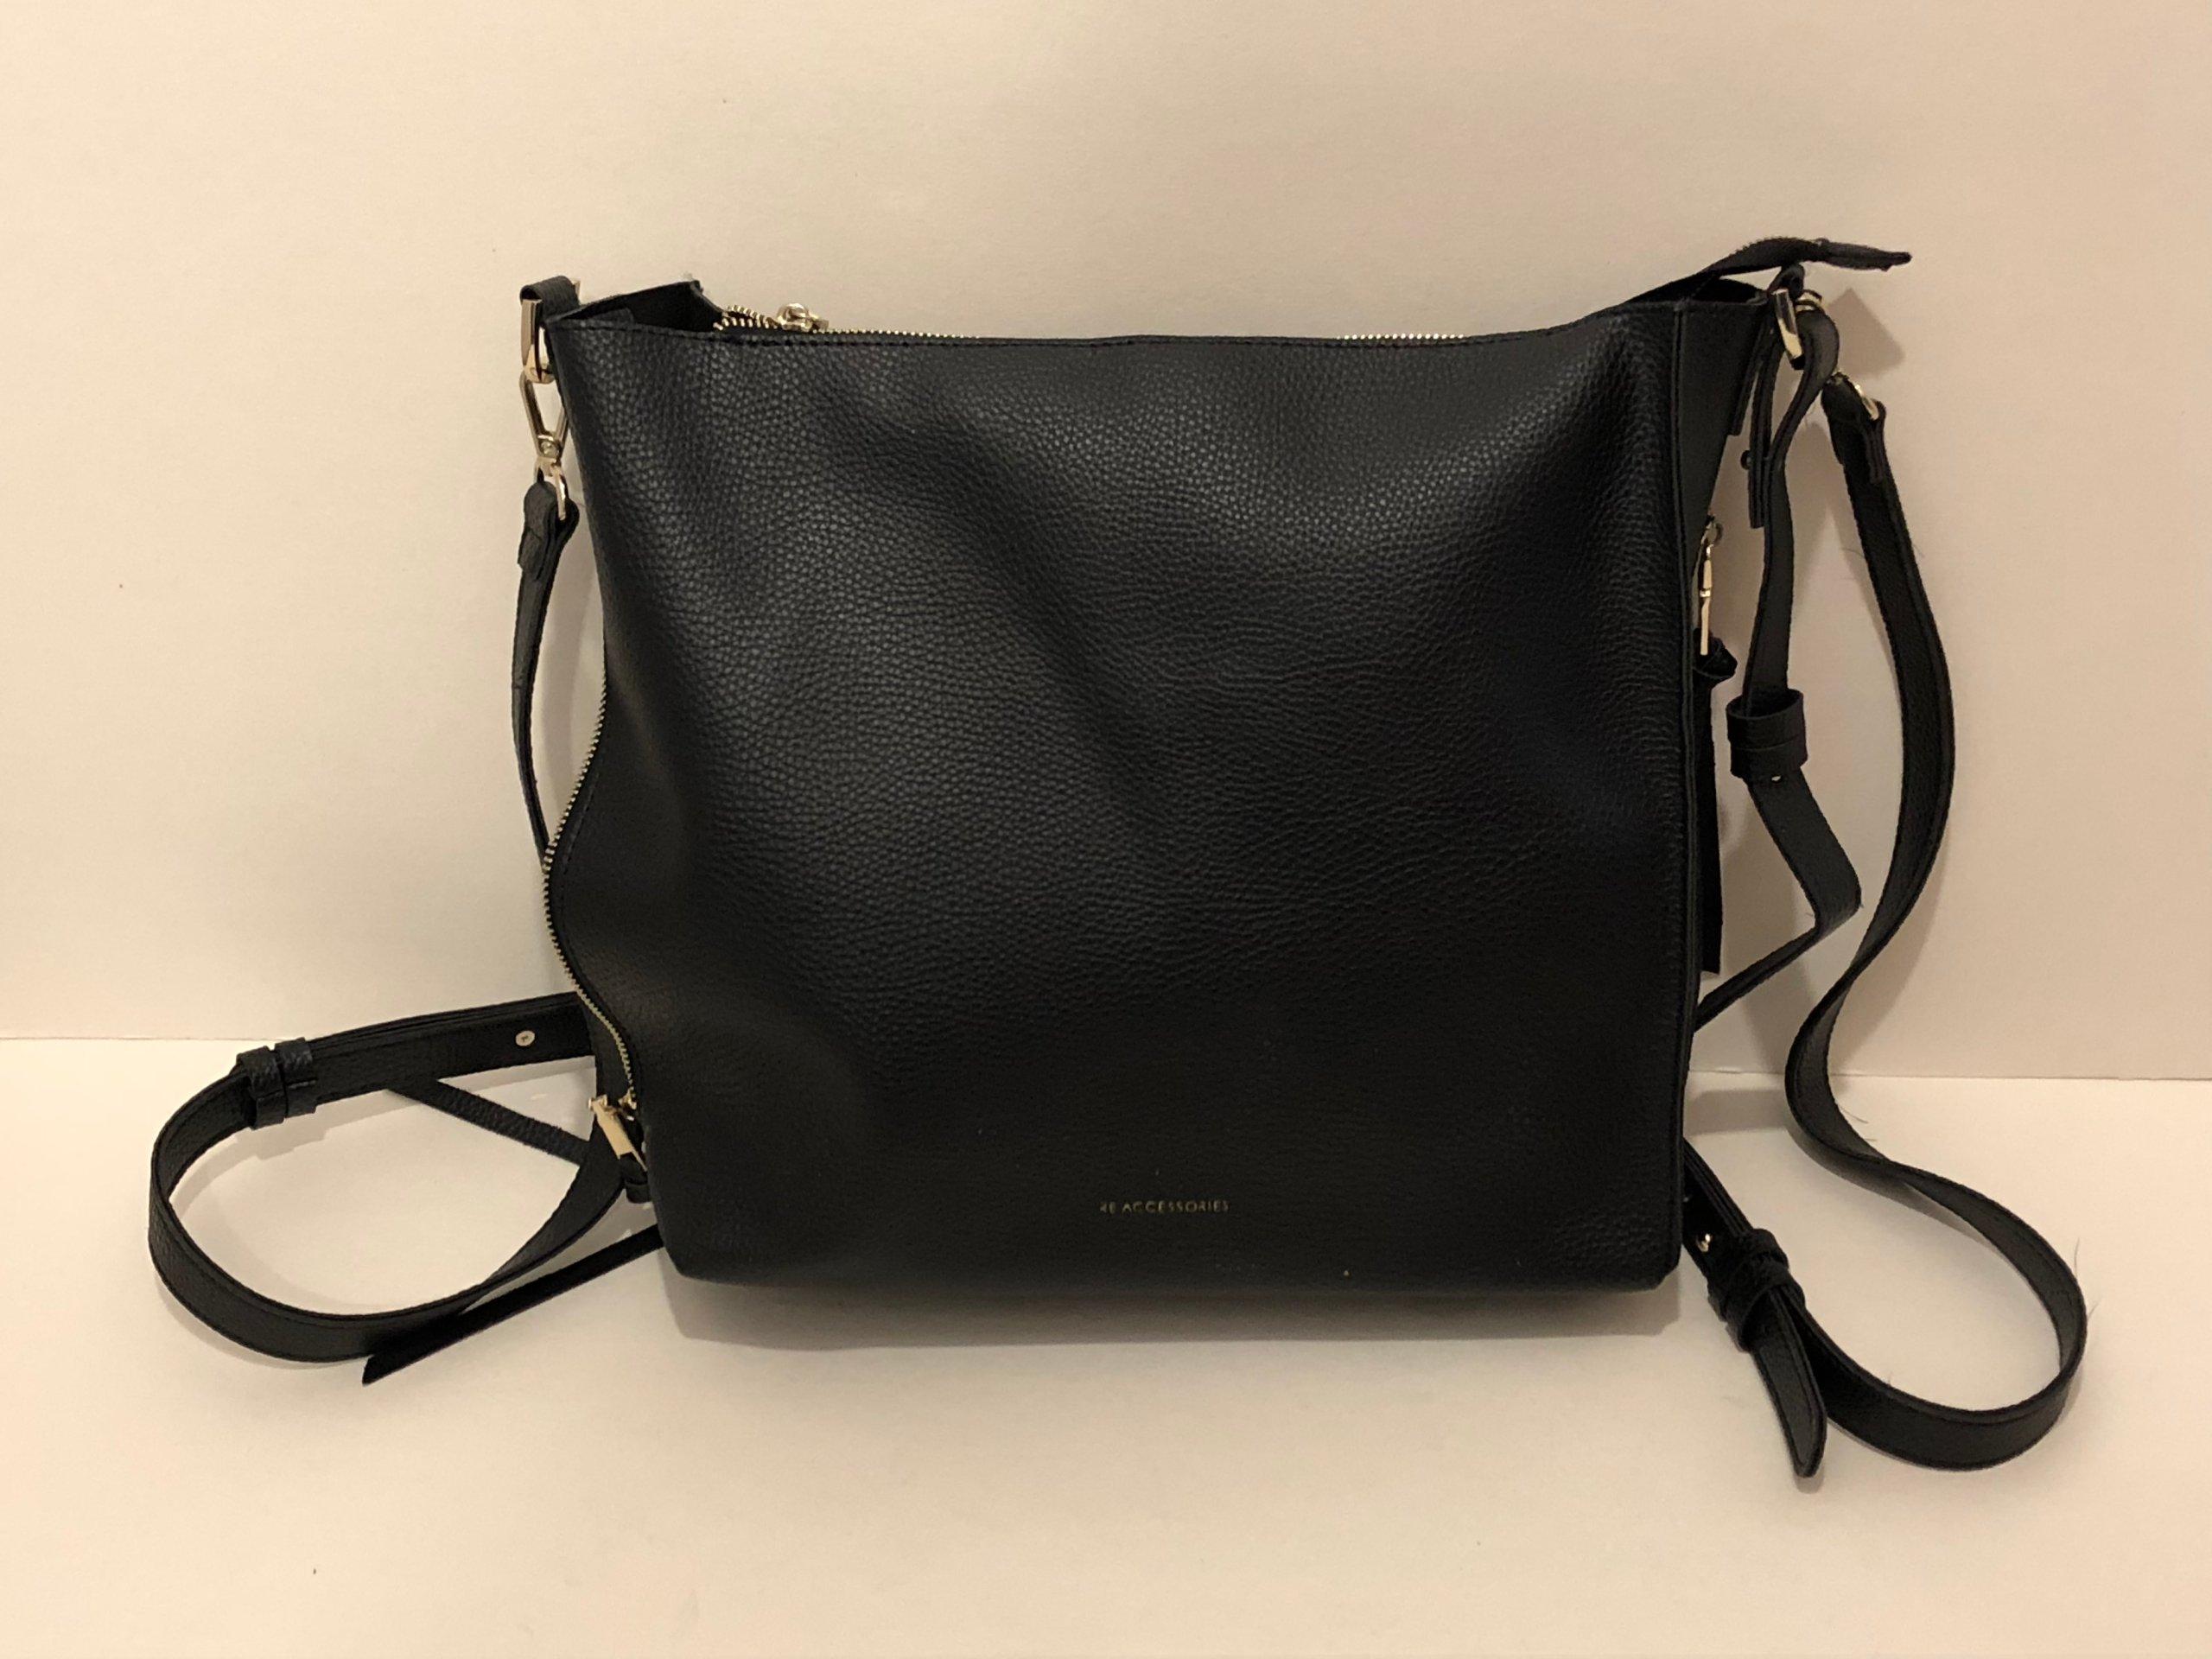 827c1376bc1 RESERVED torebka - plecak czarny Mo-291